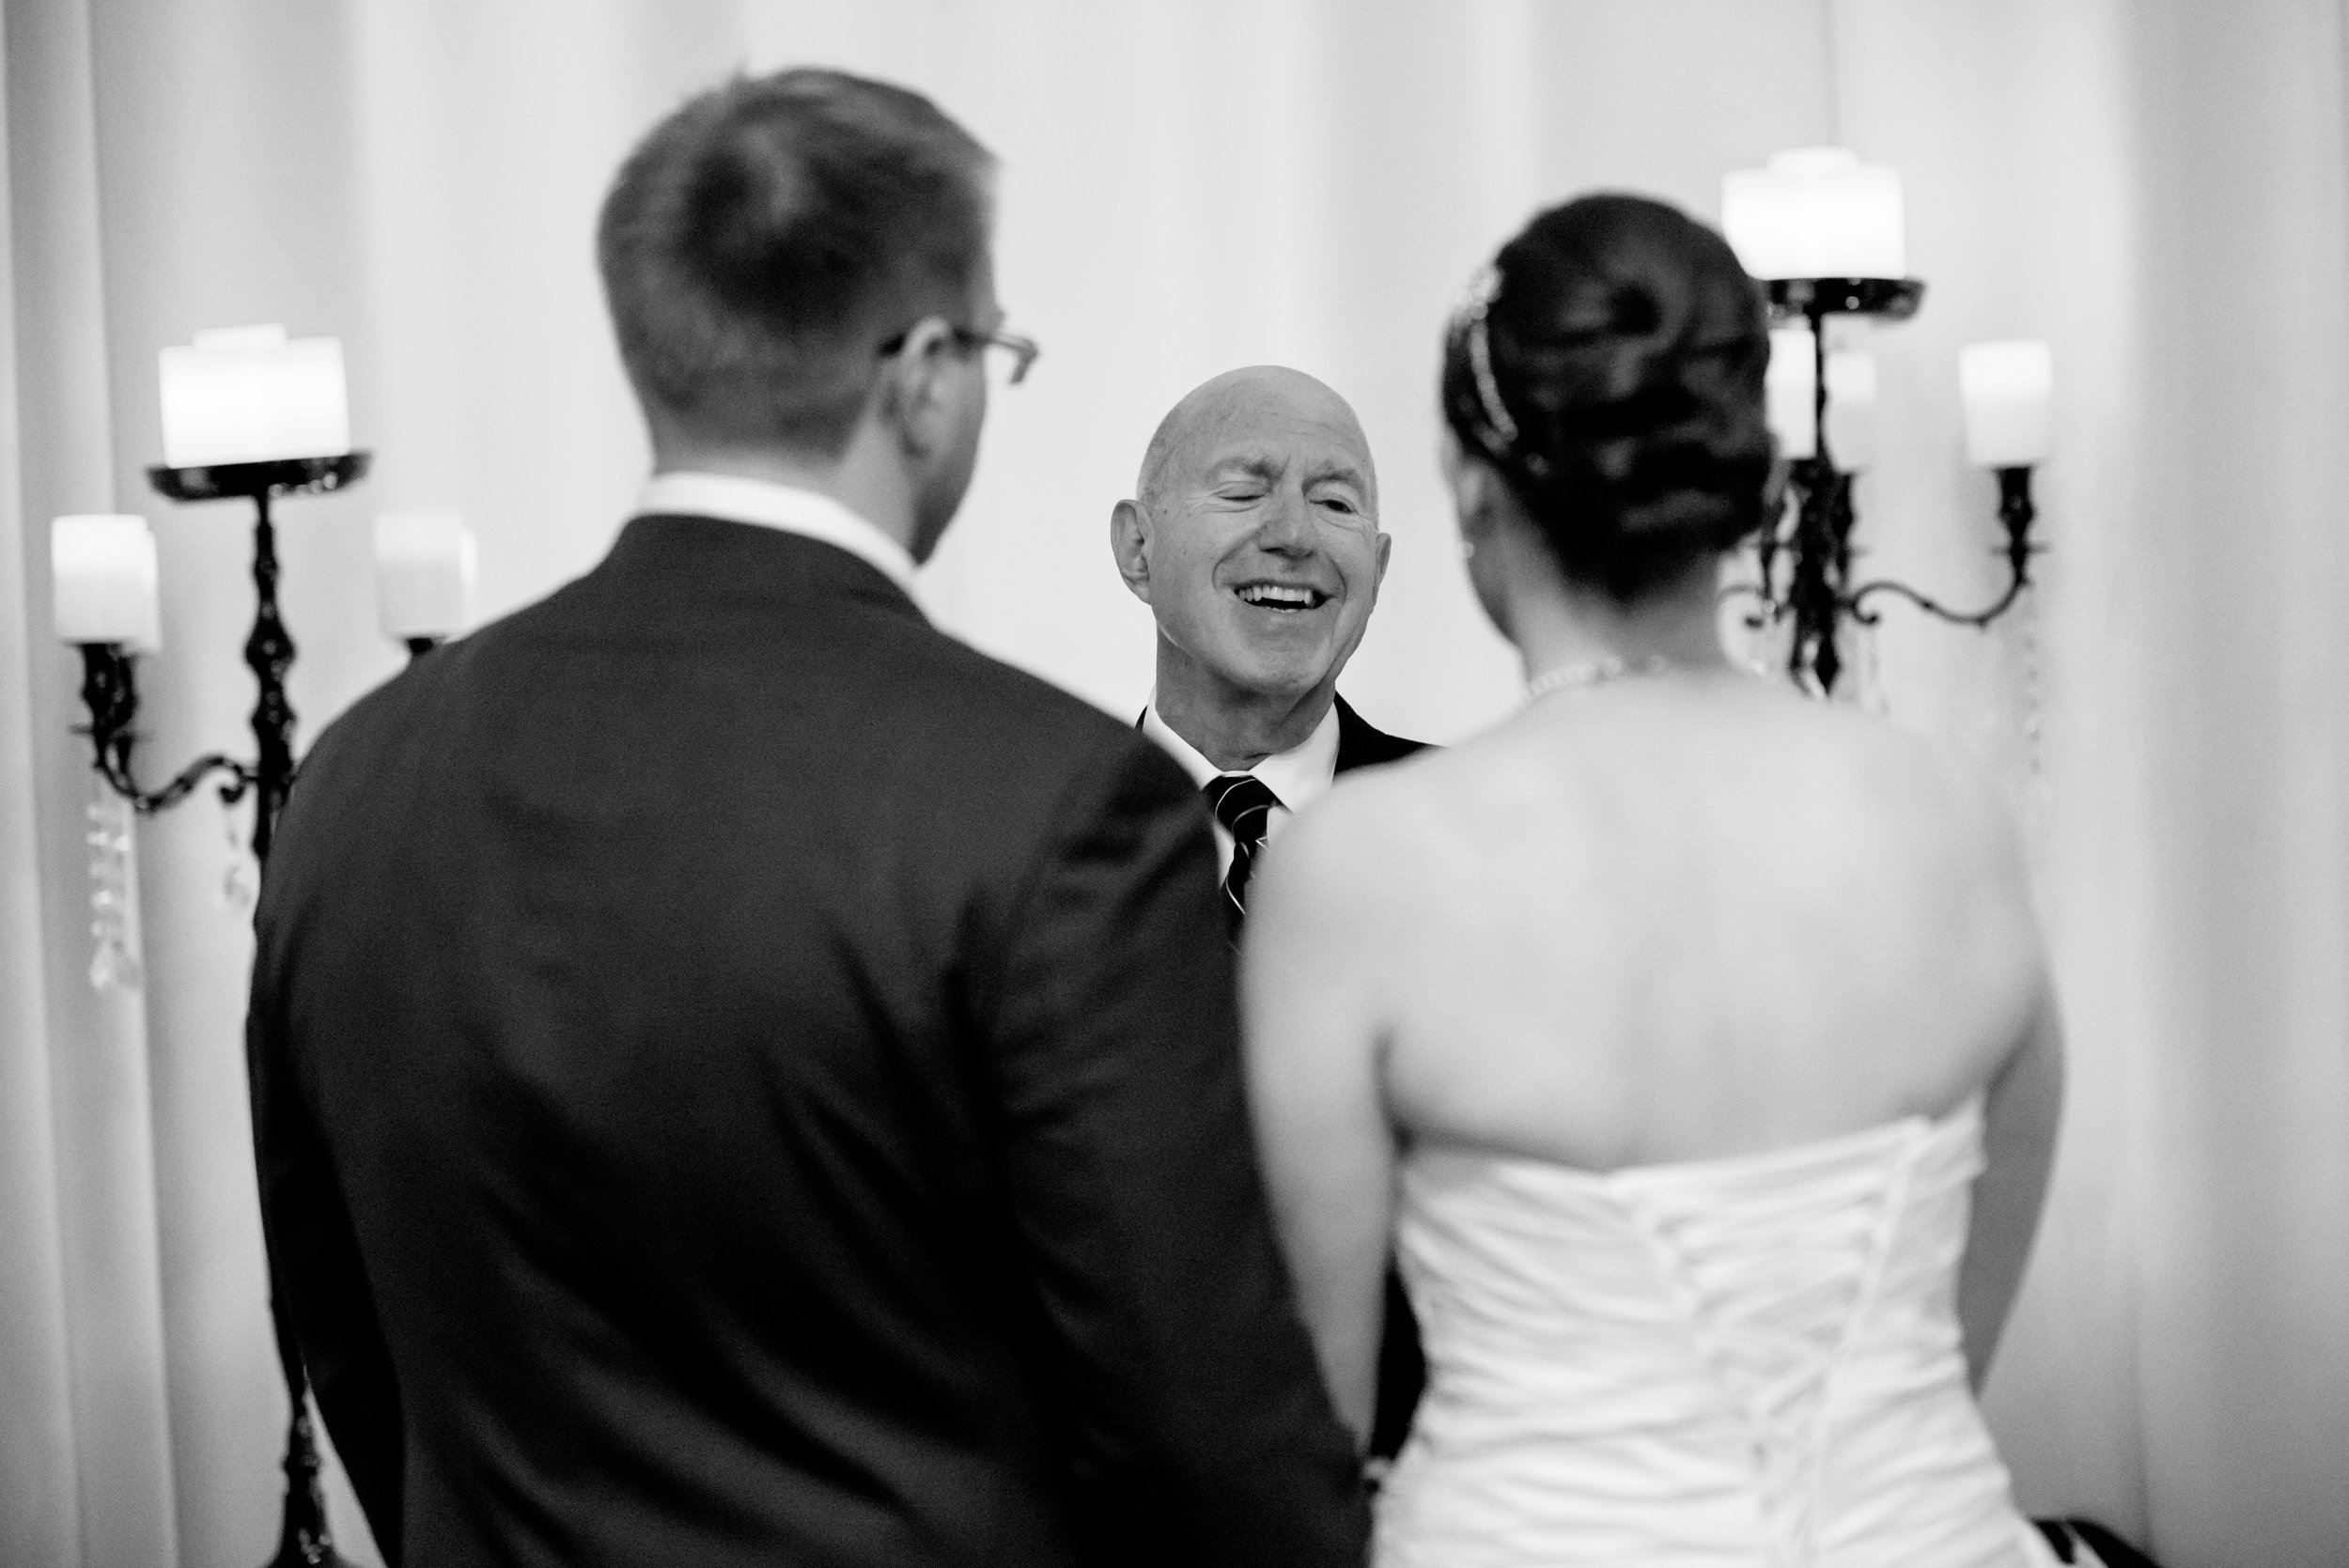 judith-john-024-citizen-hotel-sacramento-wedding-photographer-katherine-nicole-photography.JPG